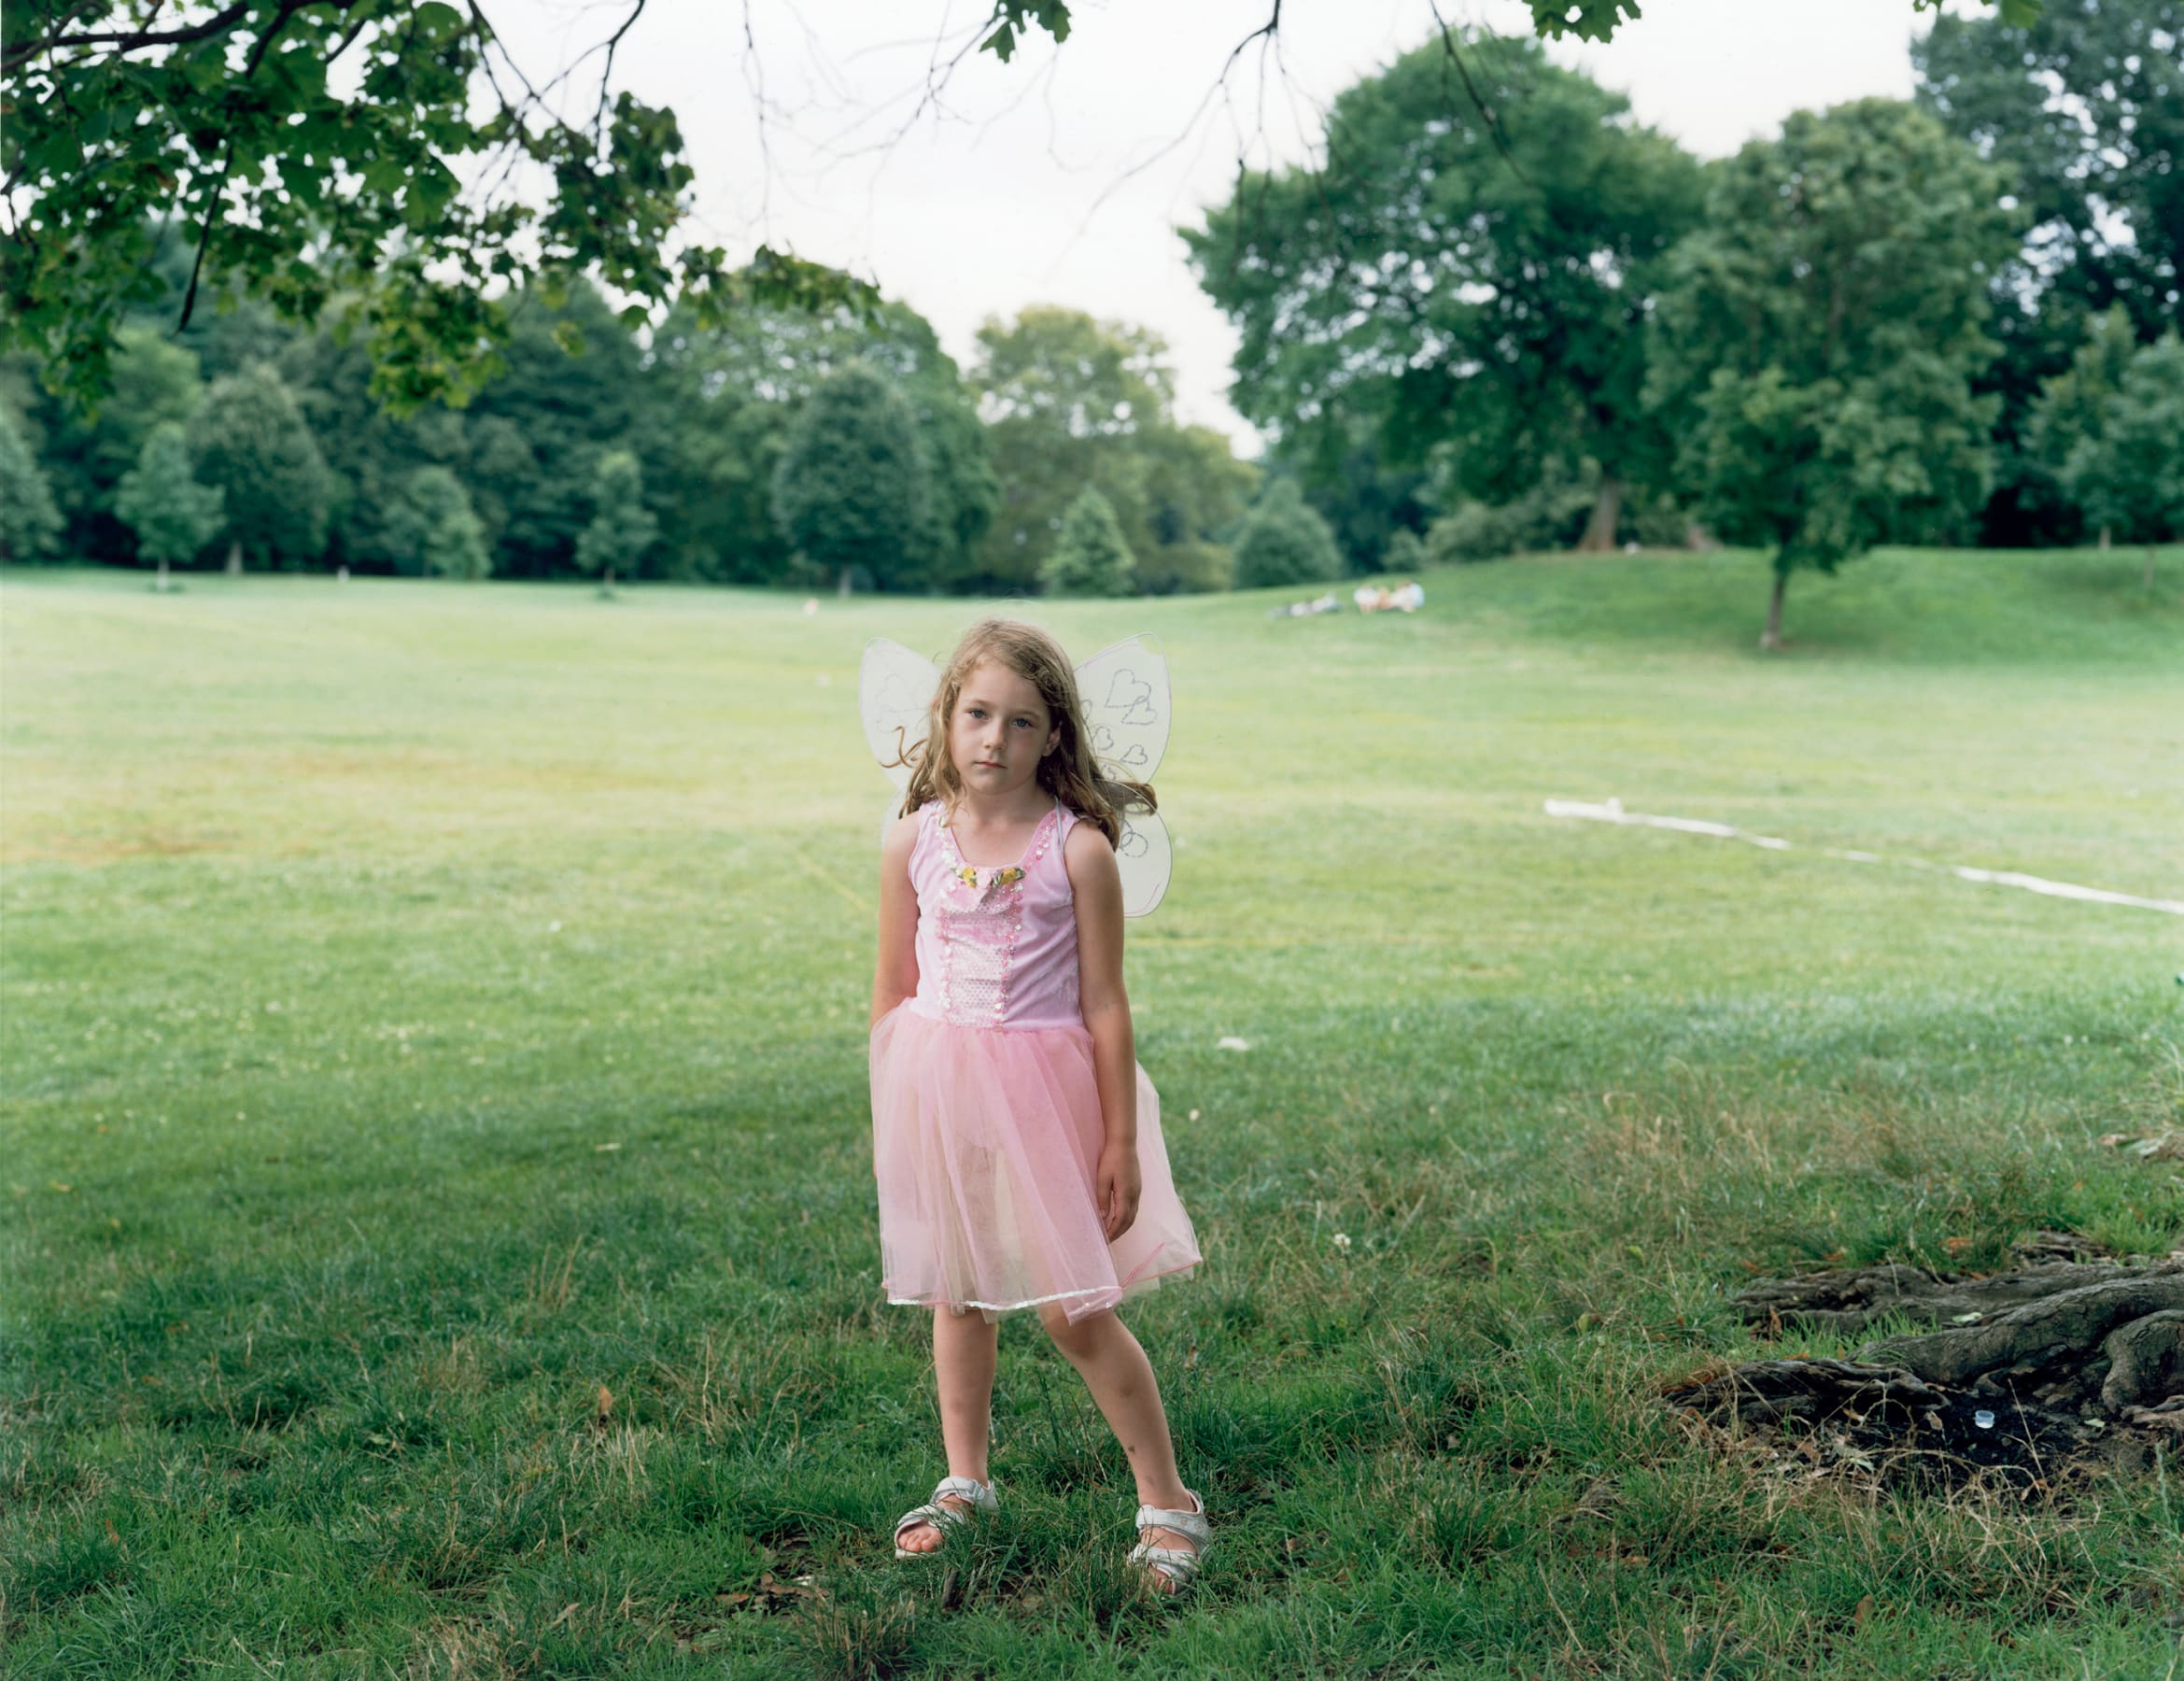 Rineke Dijkstra, Prospect Park, Brooklyn, July 23, 2006, 2006